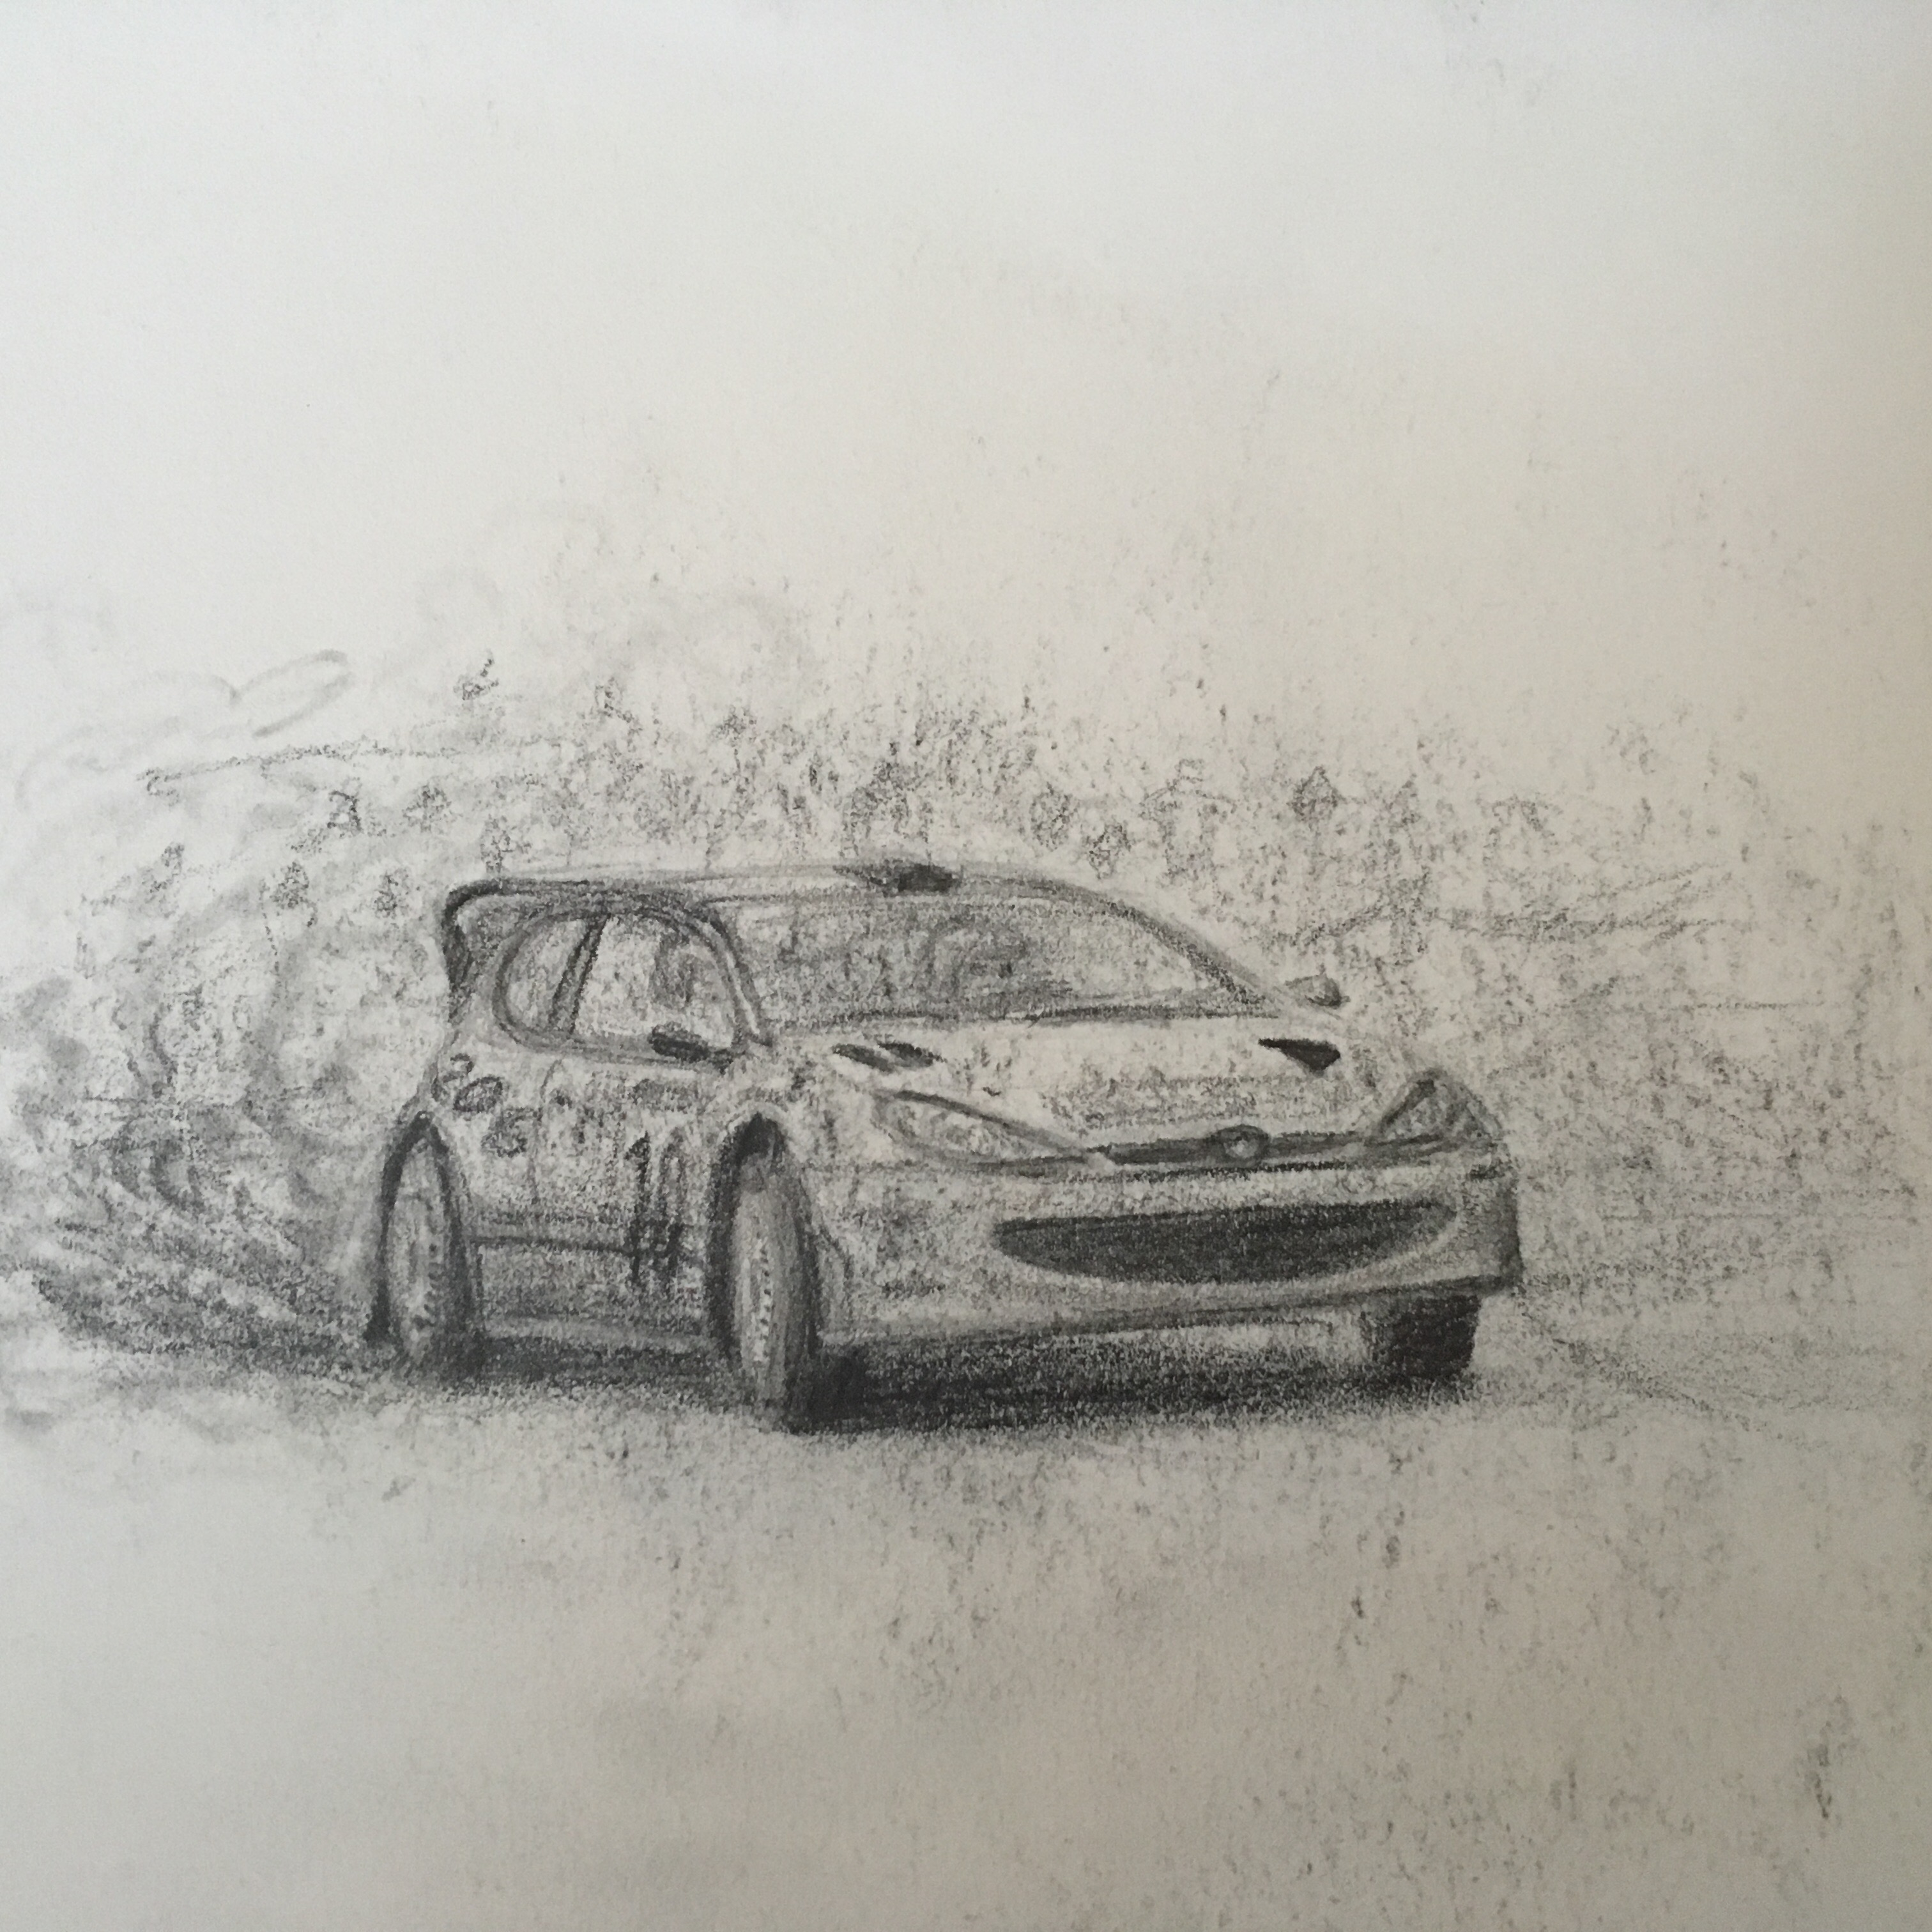 My Drawing Of Peugeot 206 Wrc